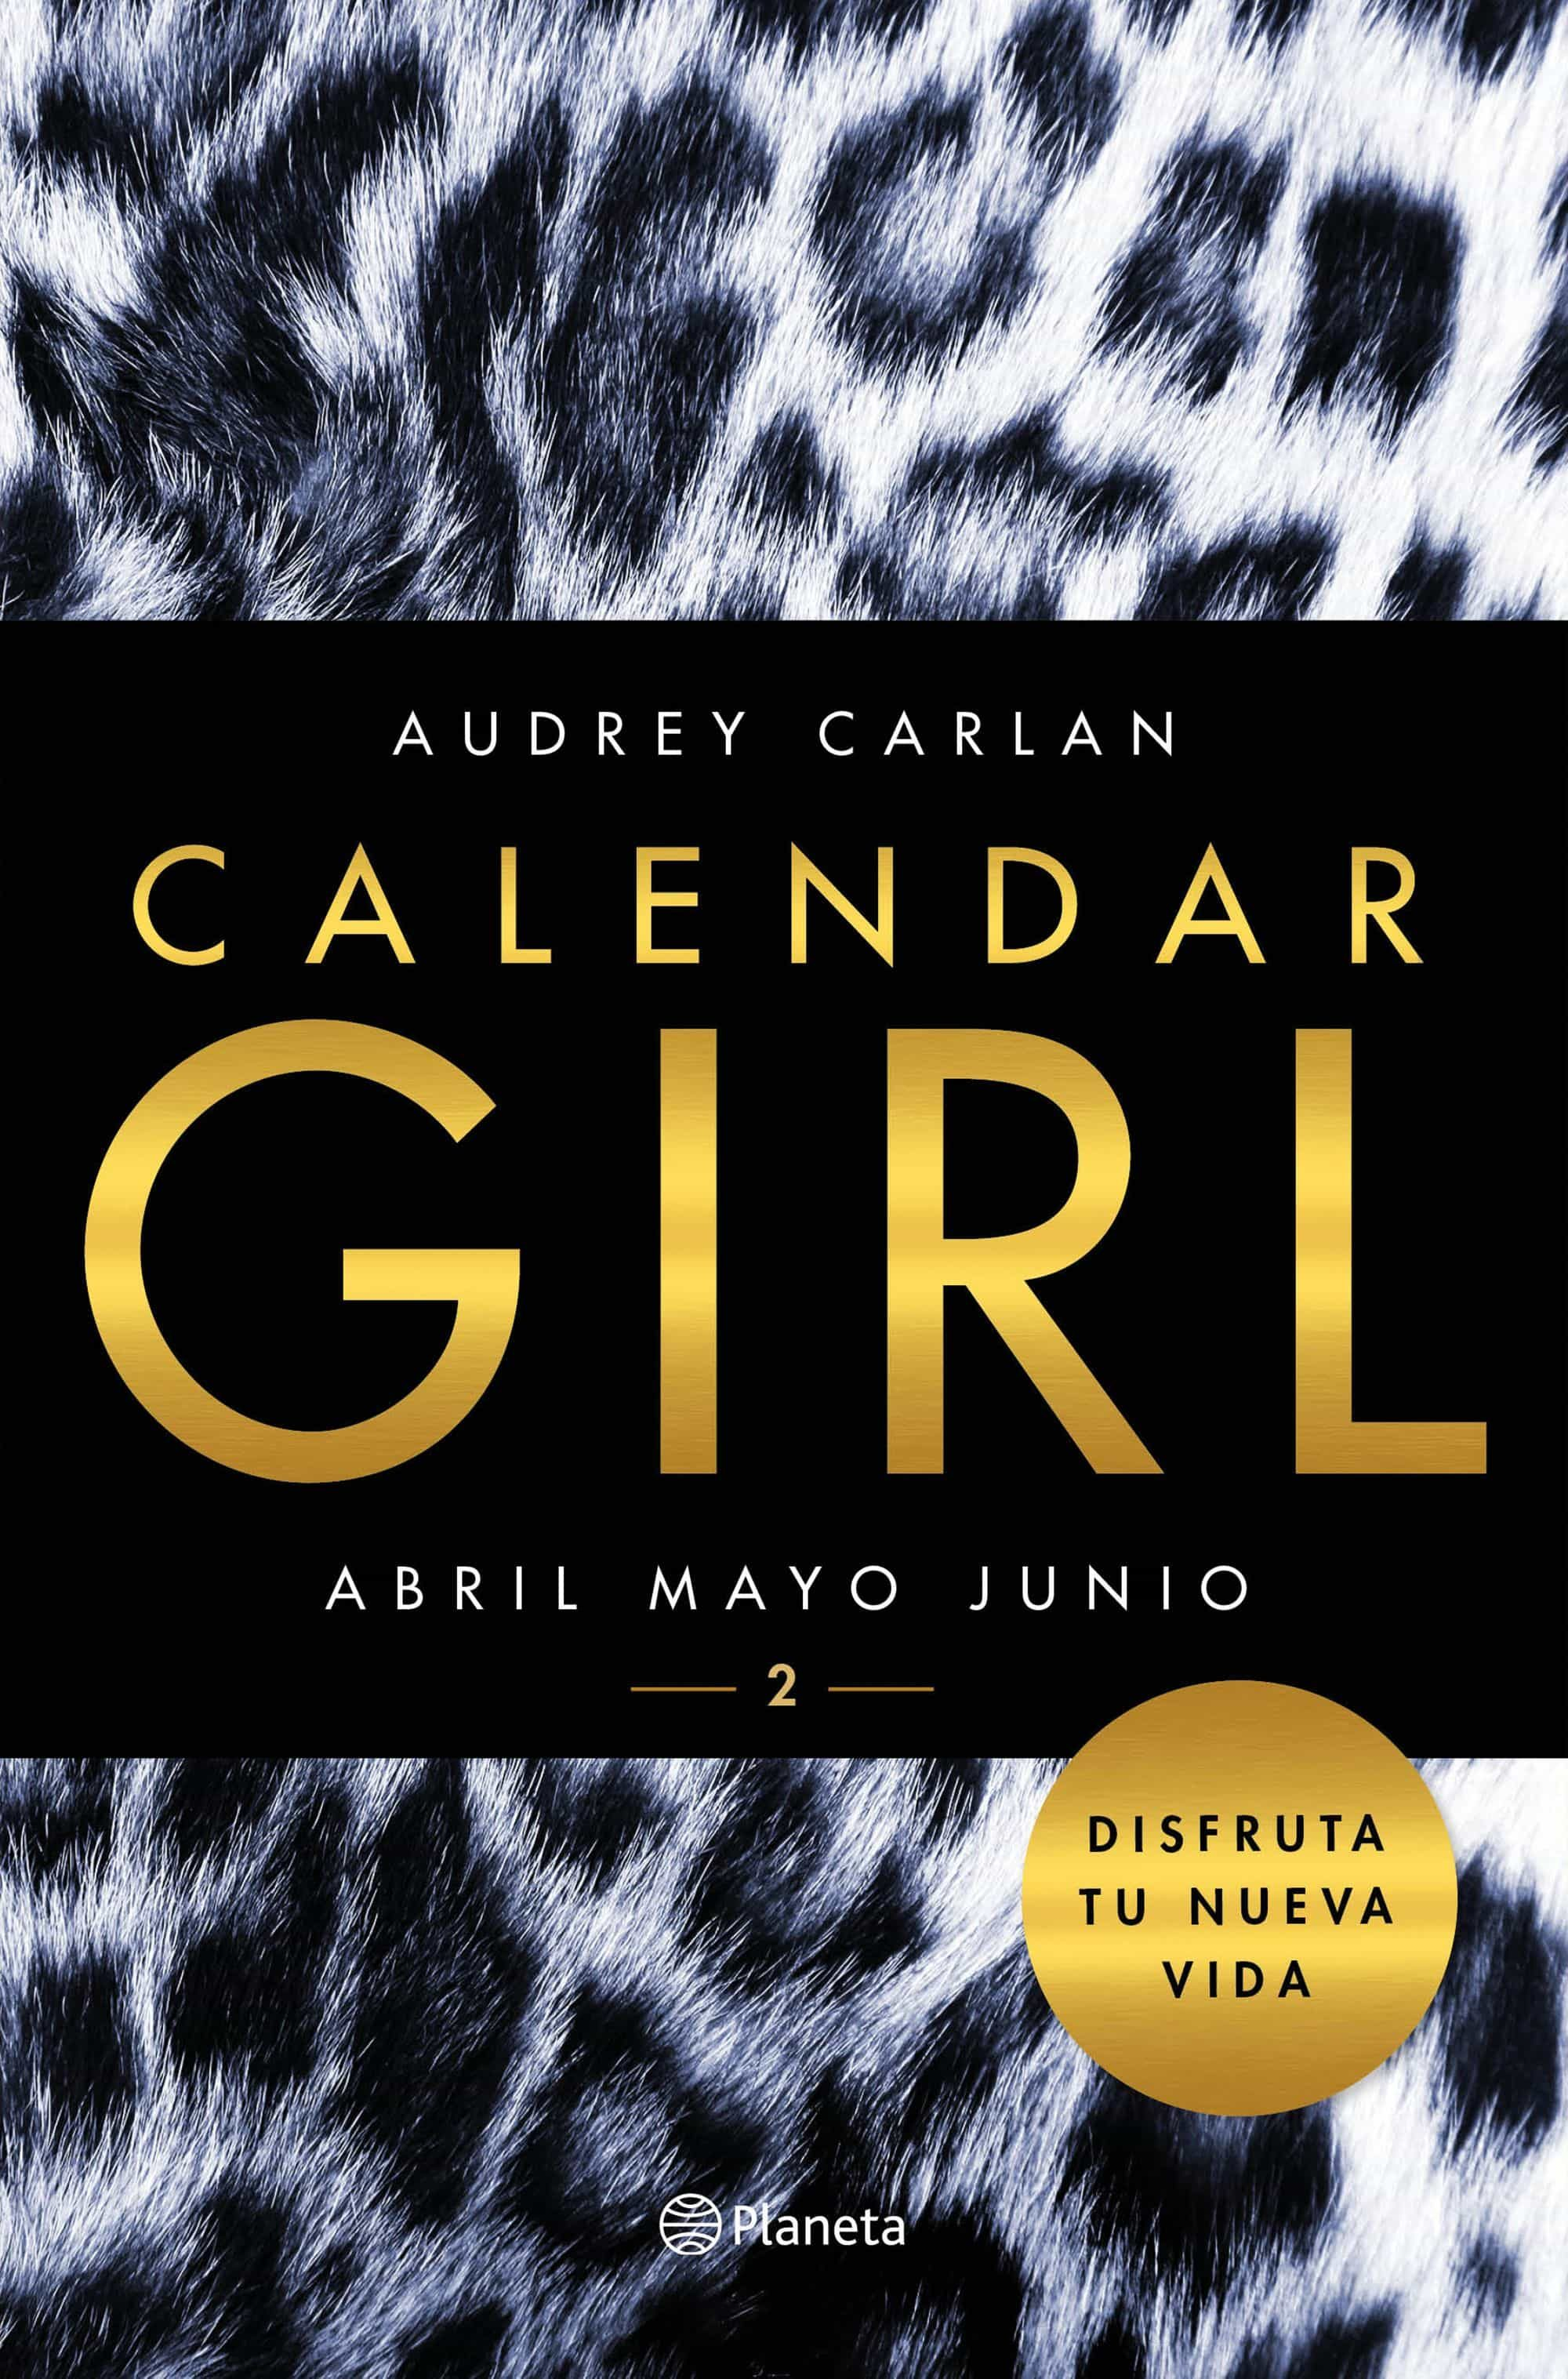 Resultado de imagen de portada calendar girl 2